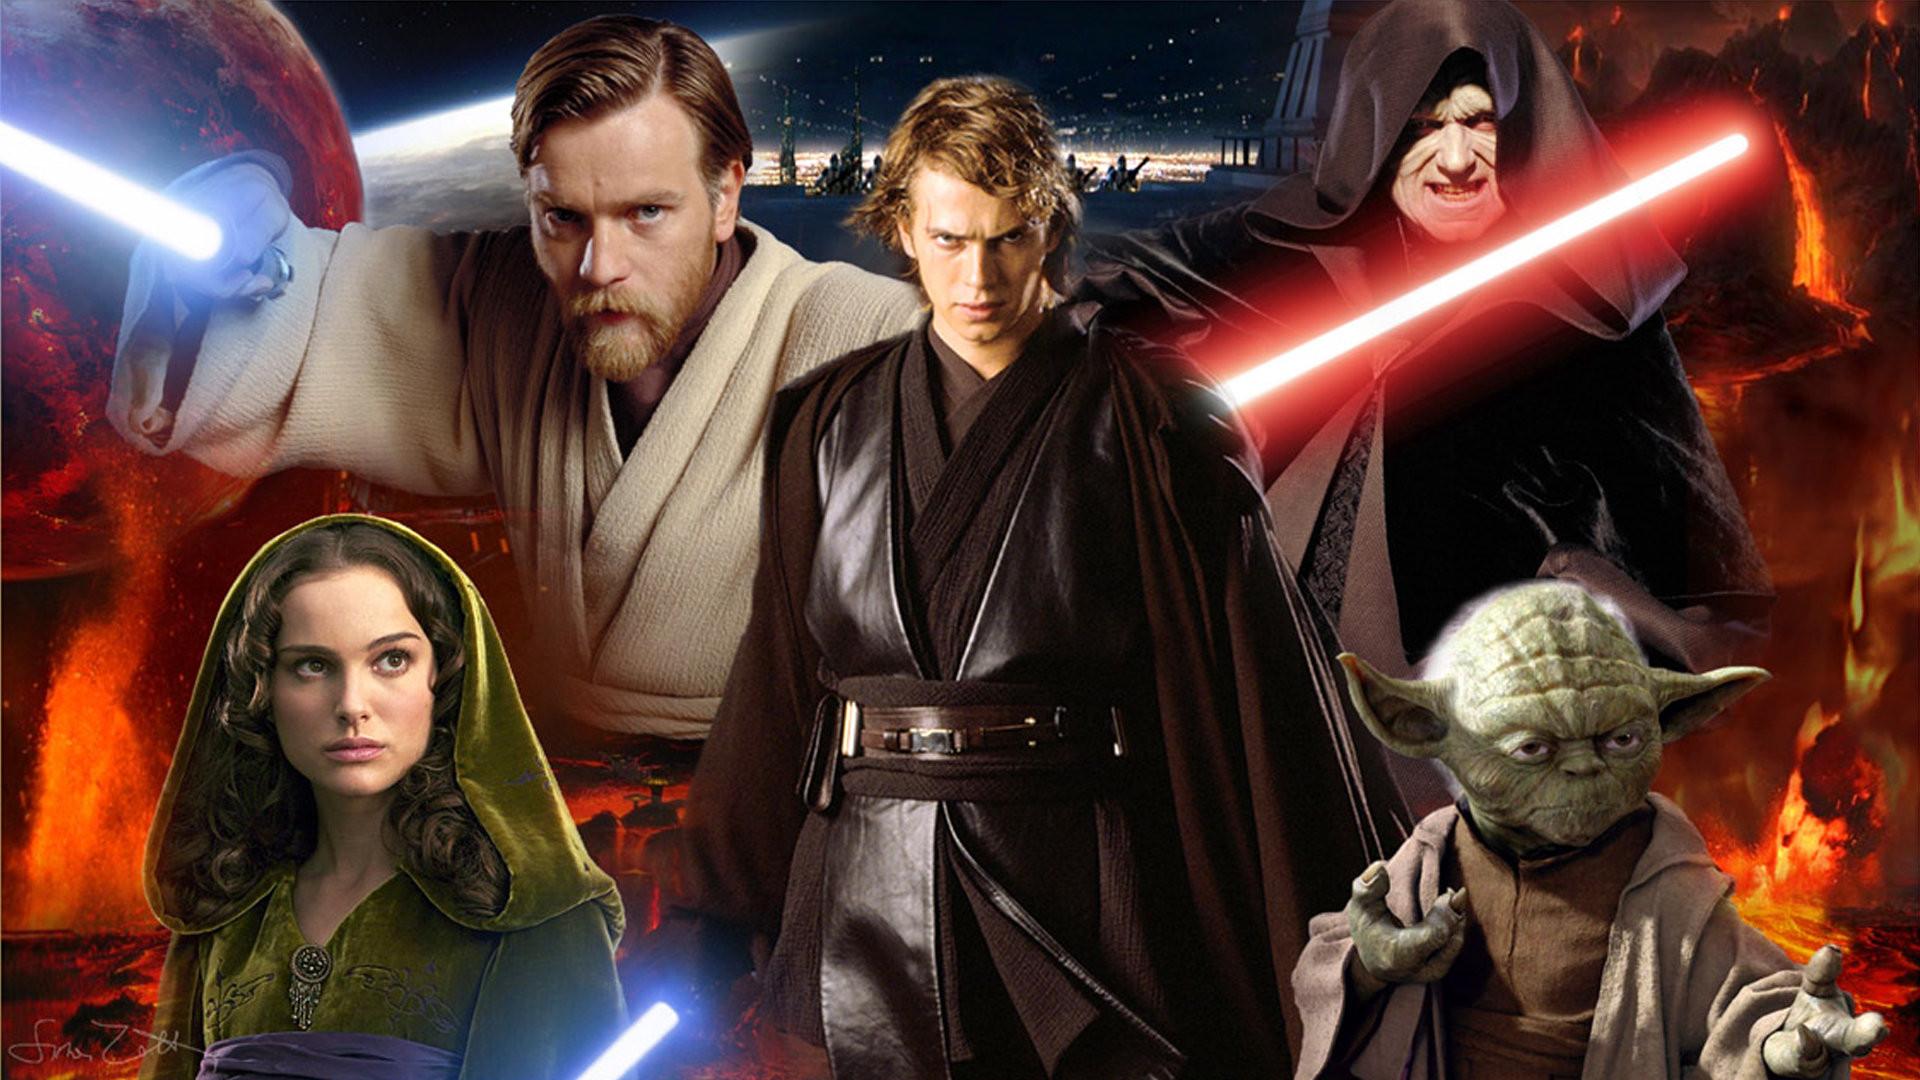 Free Download Star Wars Episode Iii Revenge Of The Sith Art